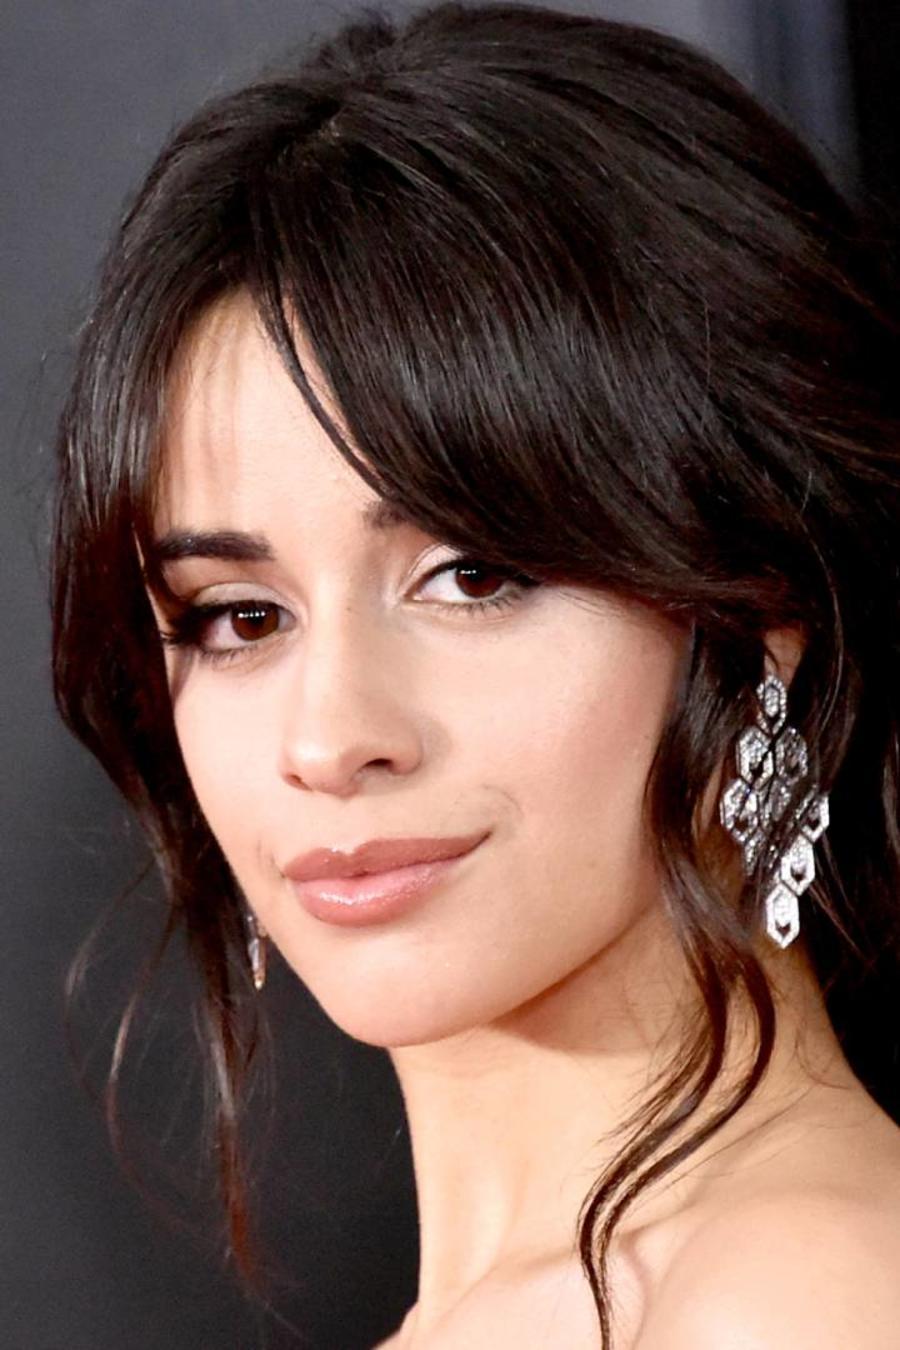 Camila Cabello Nueva York 2018